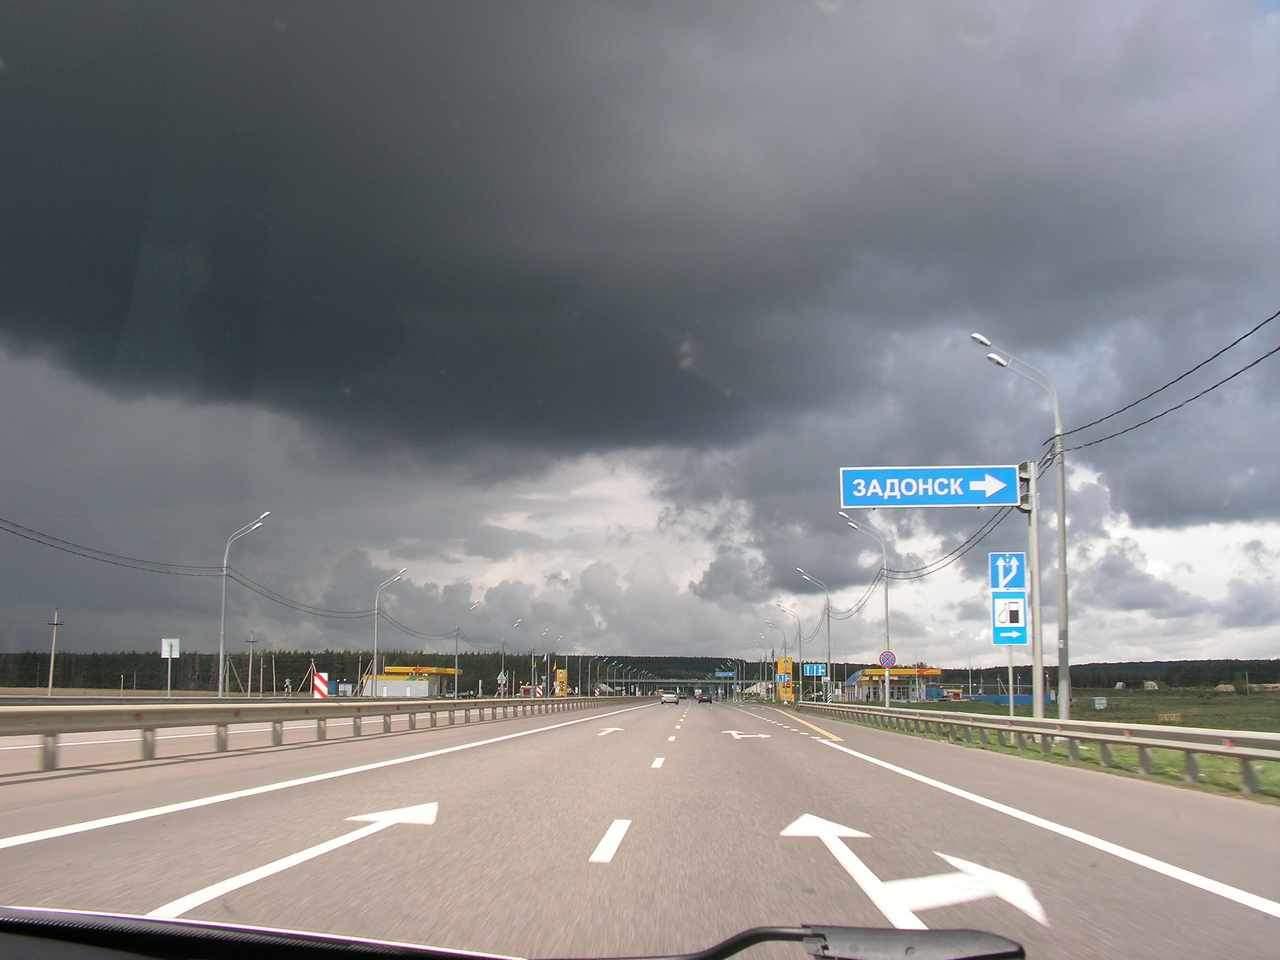 http://roadnotes.ucoz.ru/2011_platka/PICT0001.jpg